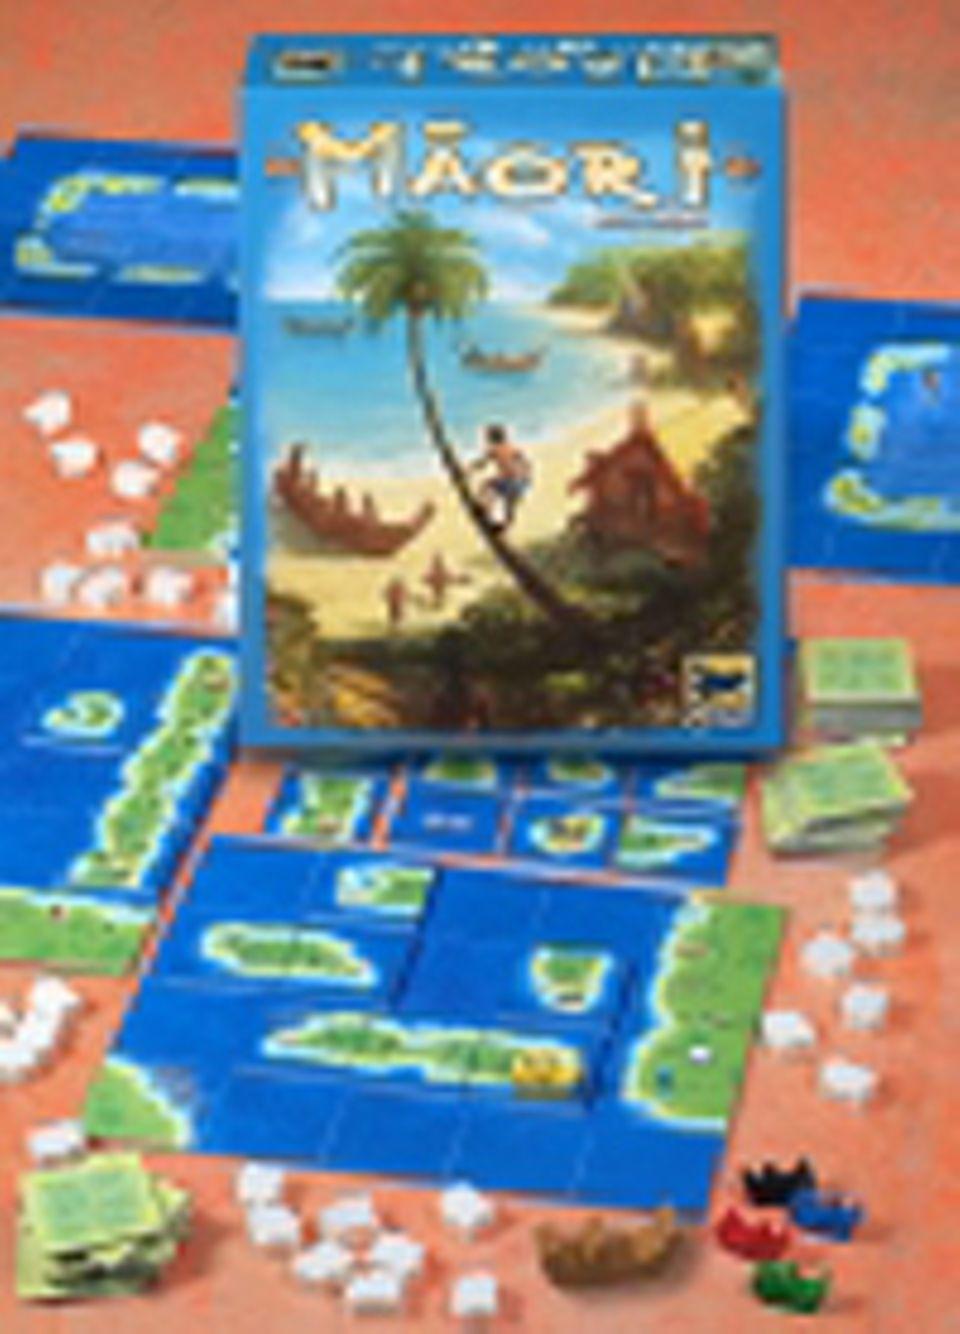 Brettspieltipps: Teil 9